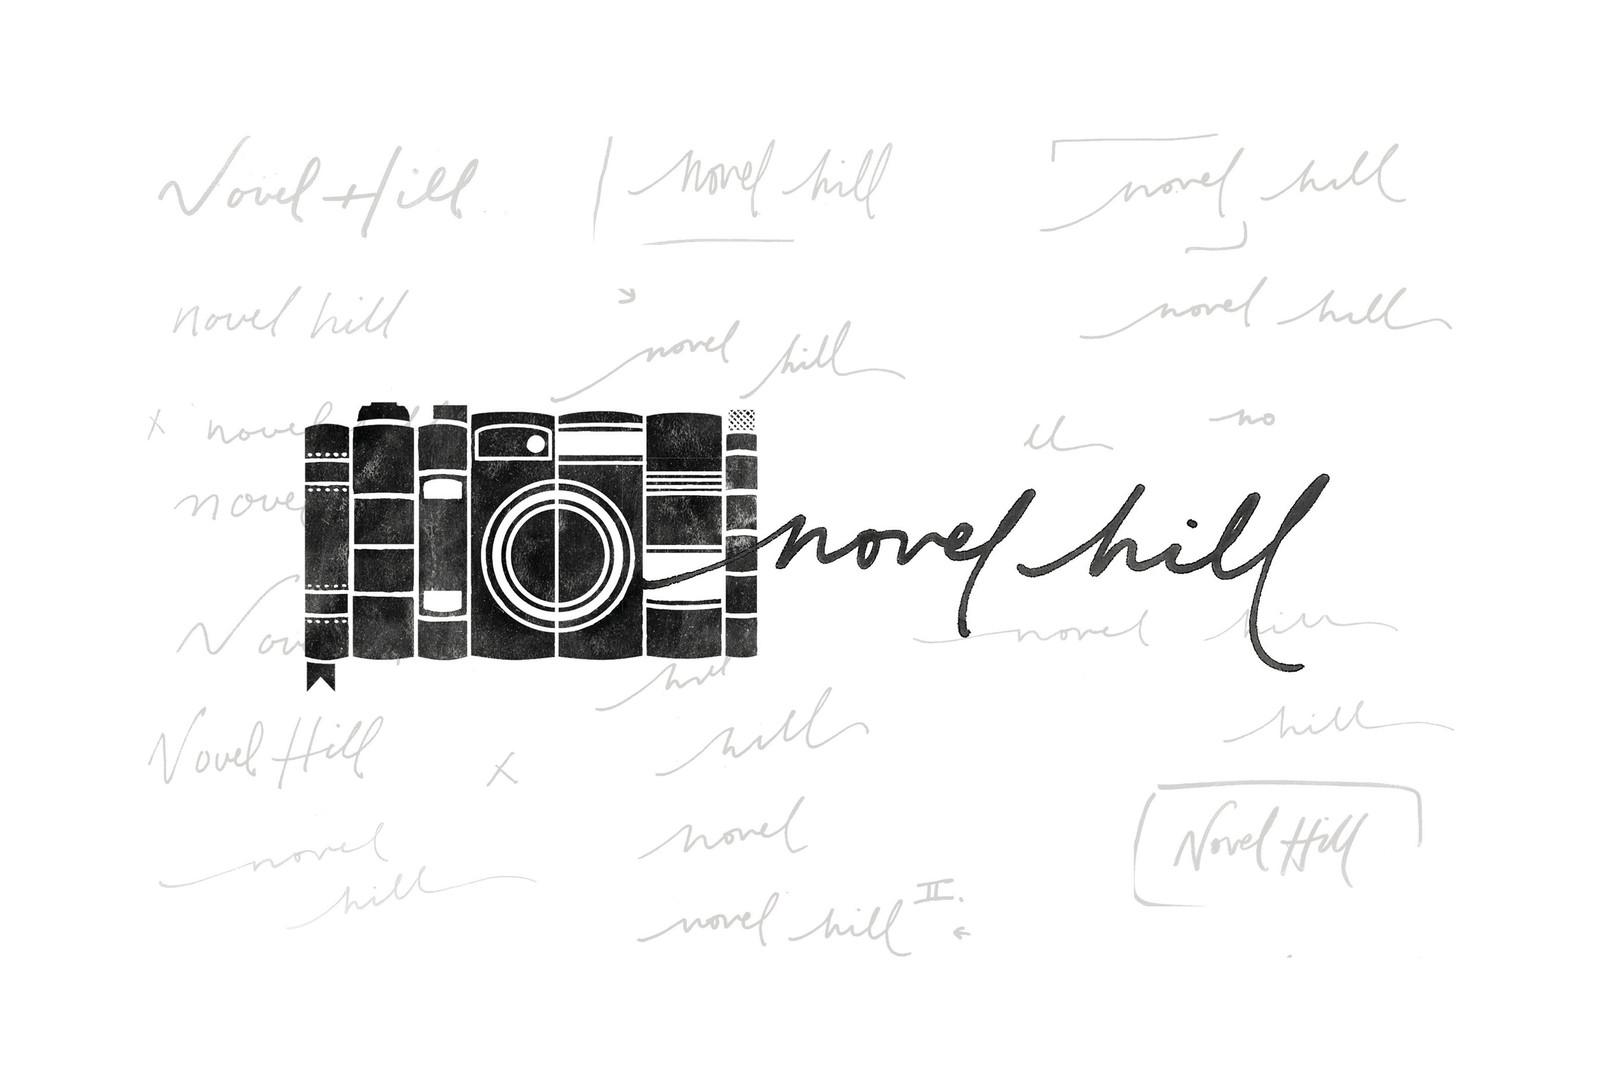 novel-hill-thumb.jpg